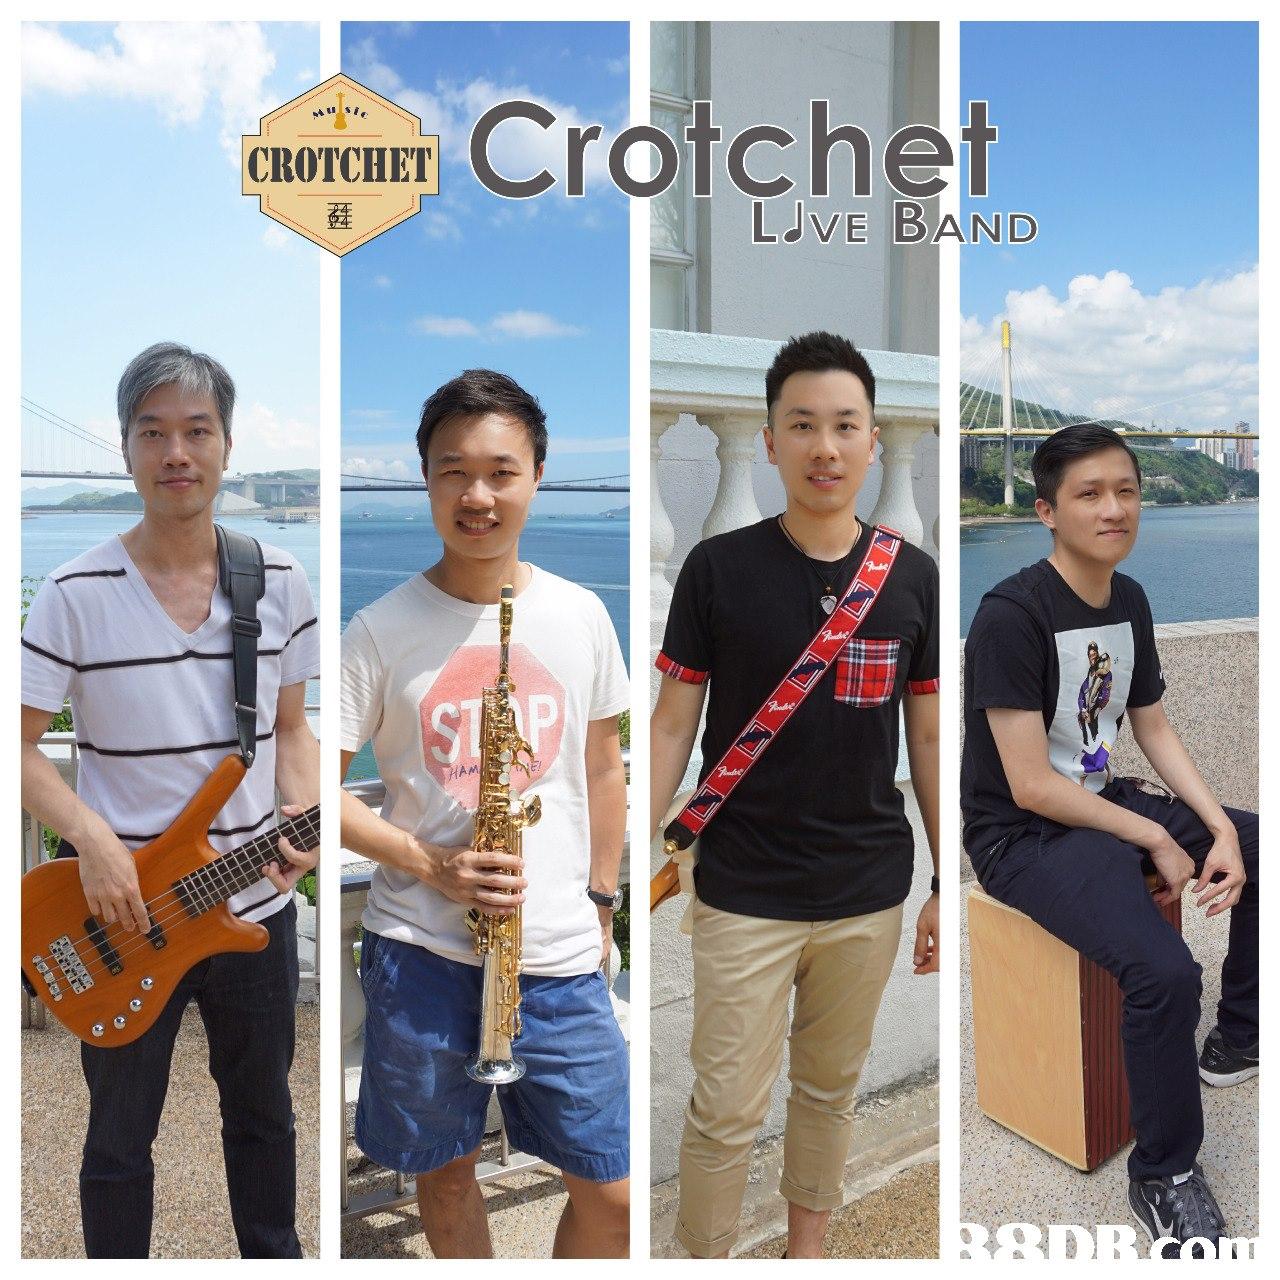 arar Crotchet CROTCIIET LVE DAND HAM  Musical instrument,Poster,